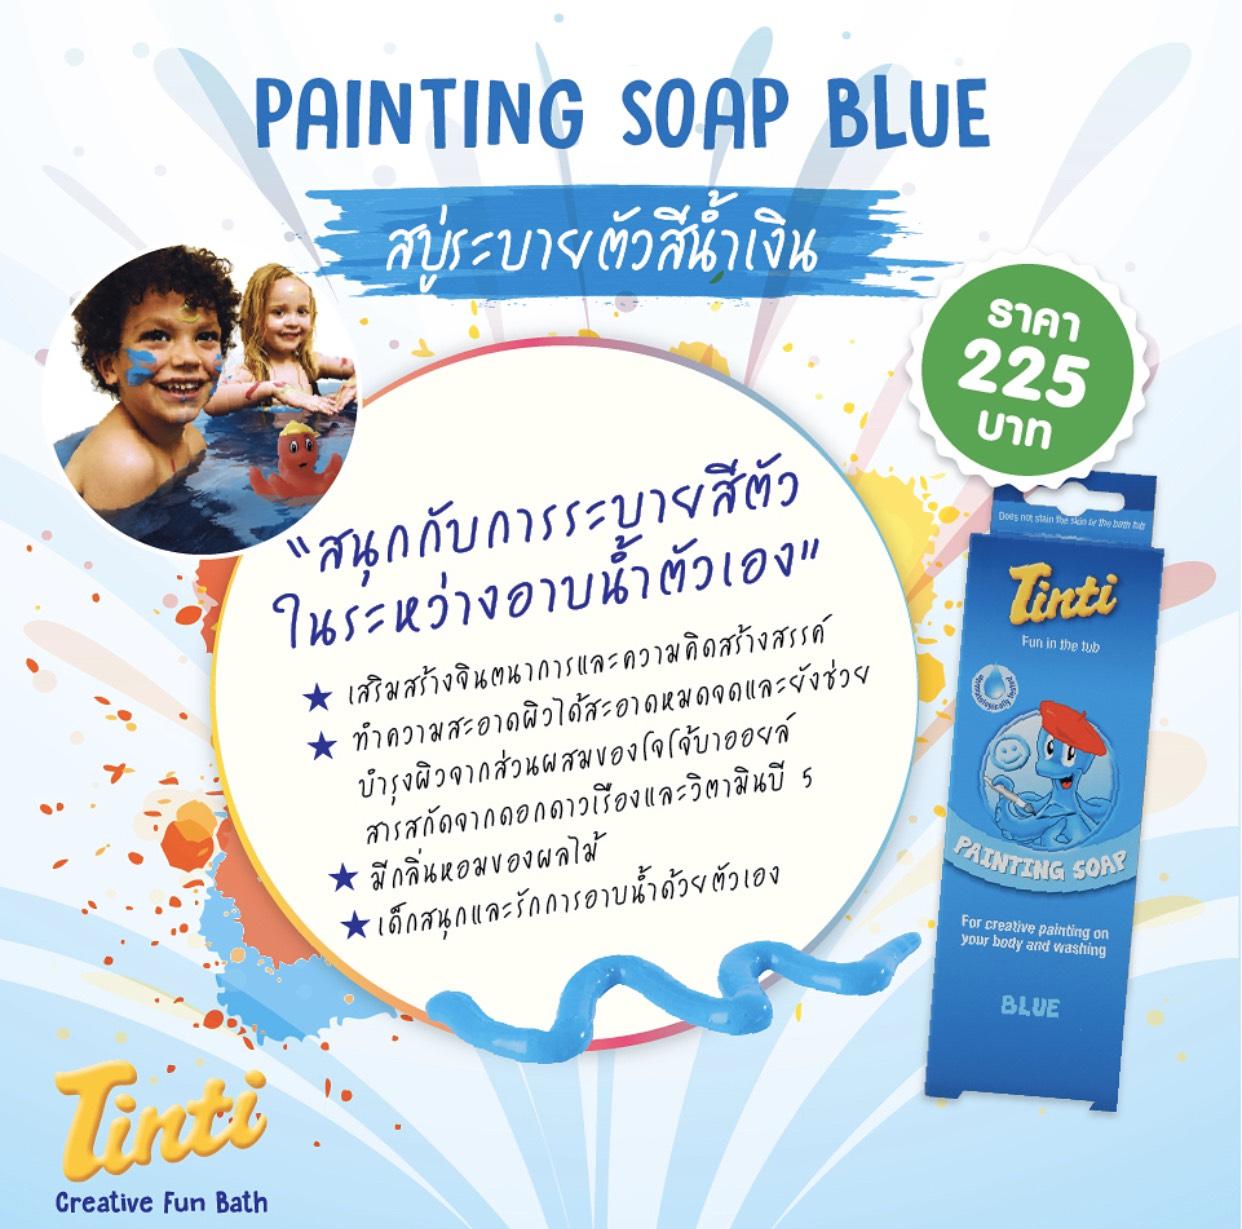 Tinti - Bath Painting Soap Blue